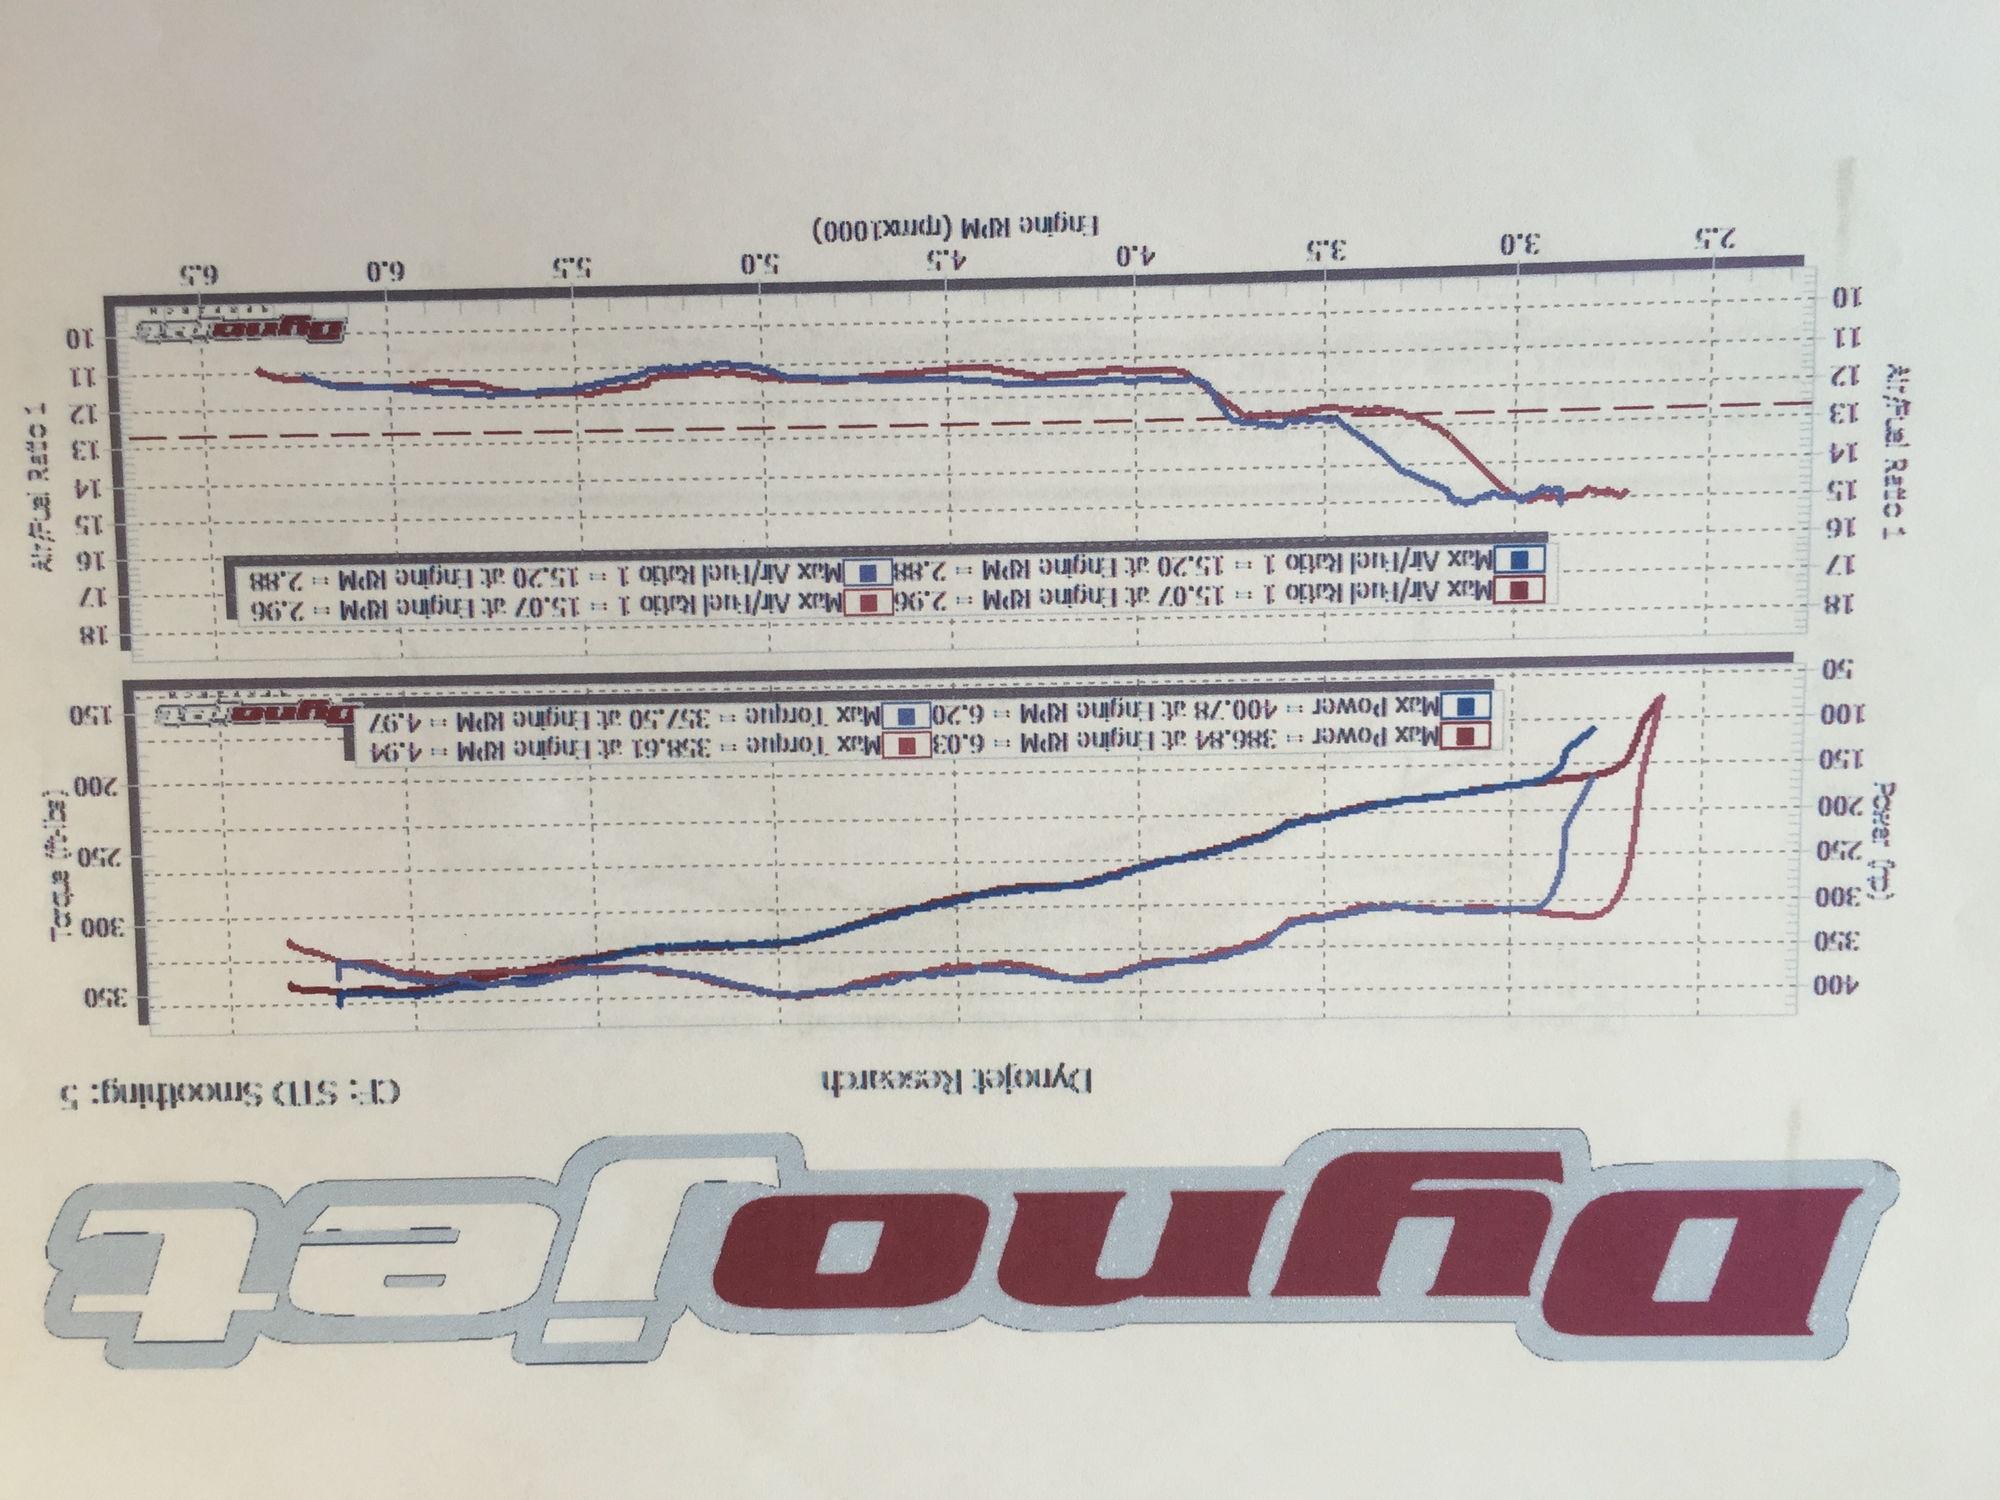 1996 Lexus Ls400 Stereo Install Wiring Info Diagrams Club Rc F Dyno Procedures Clublexus Lexus Forum Discussion